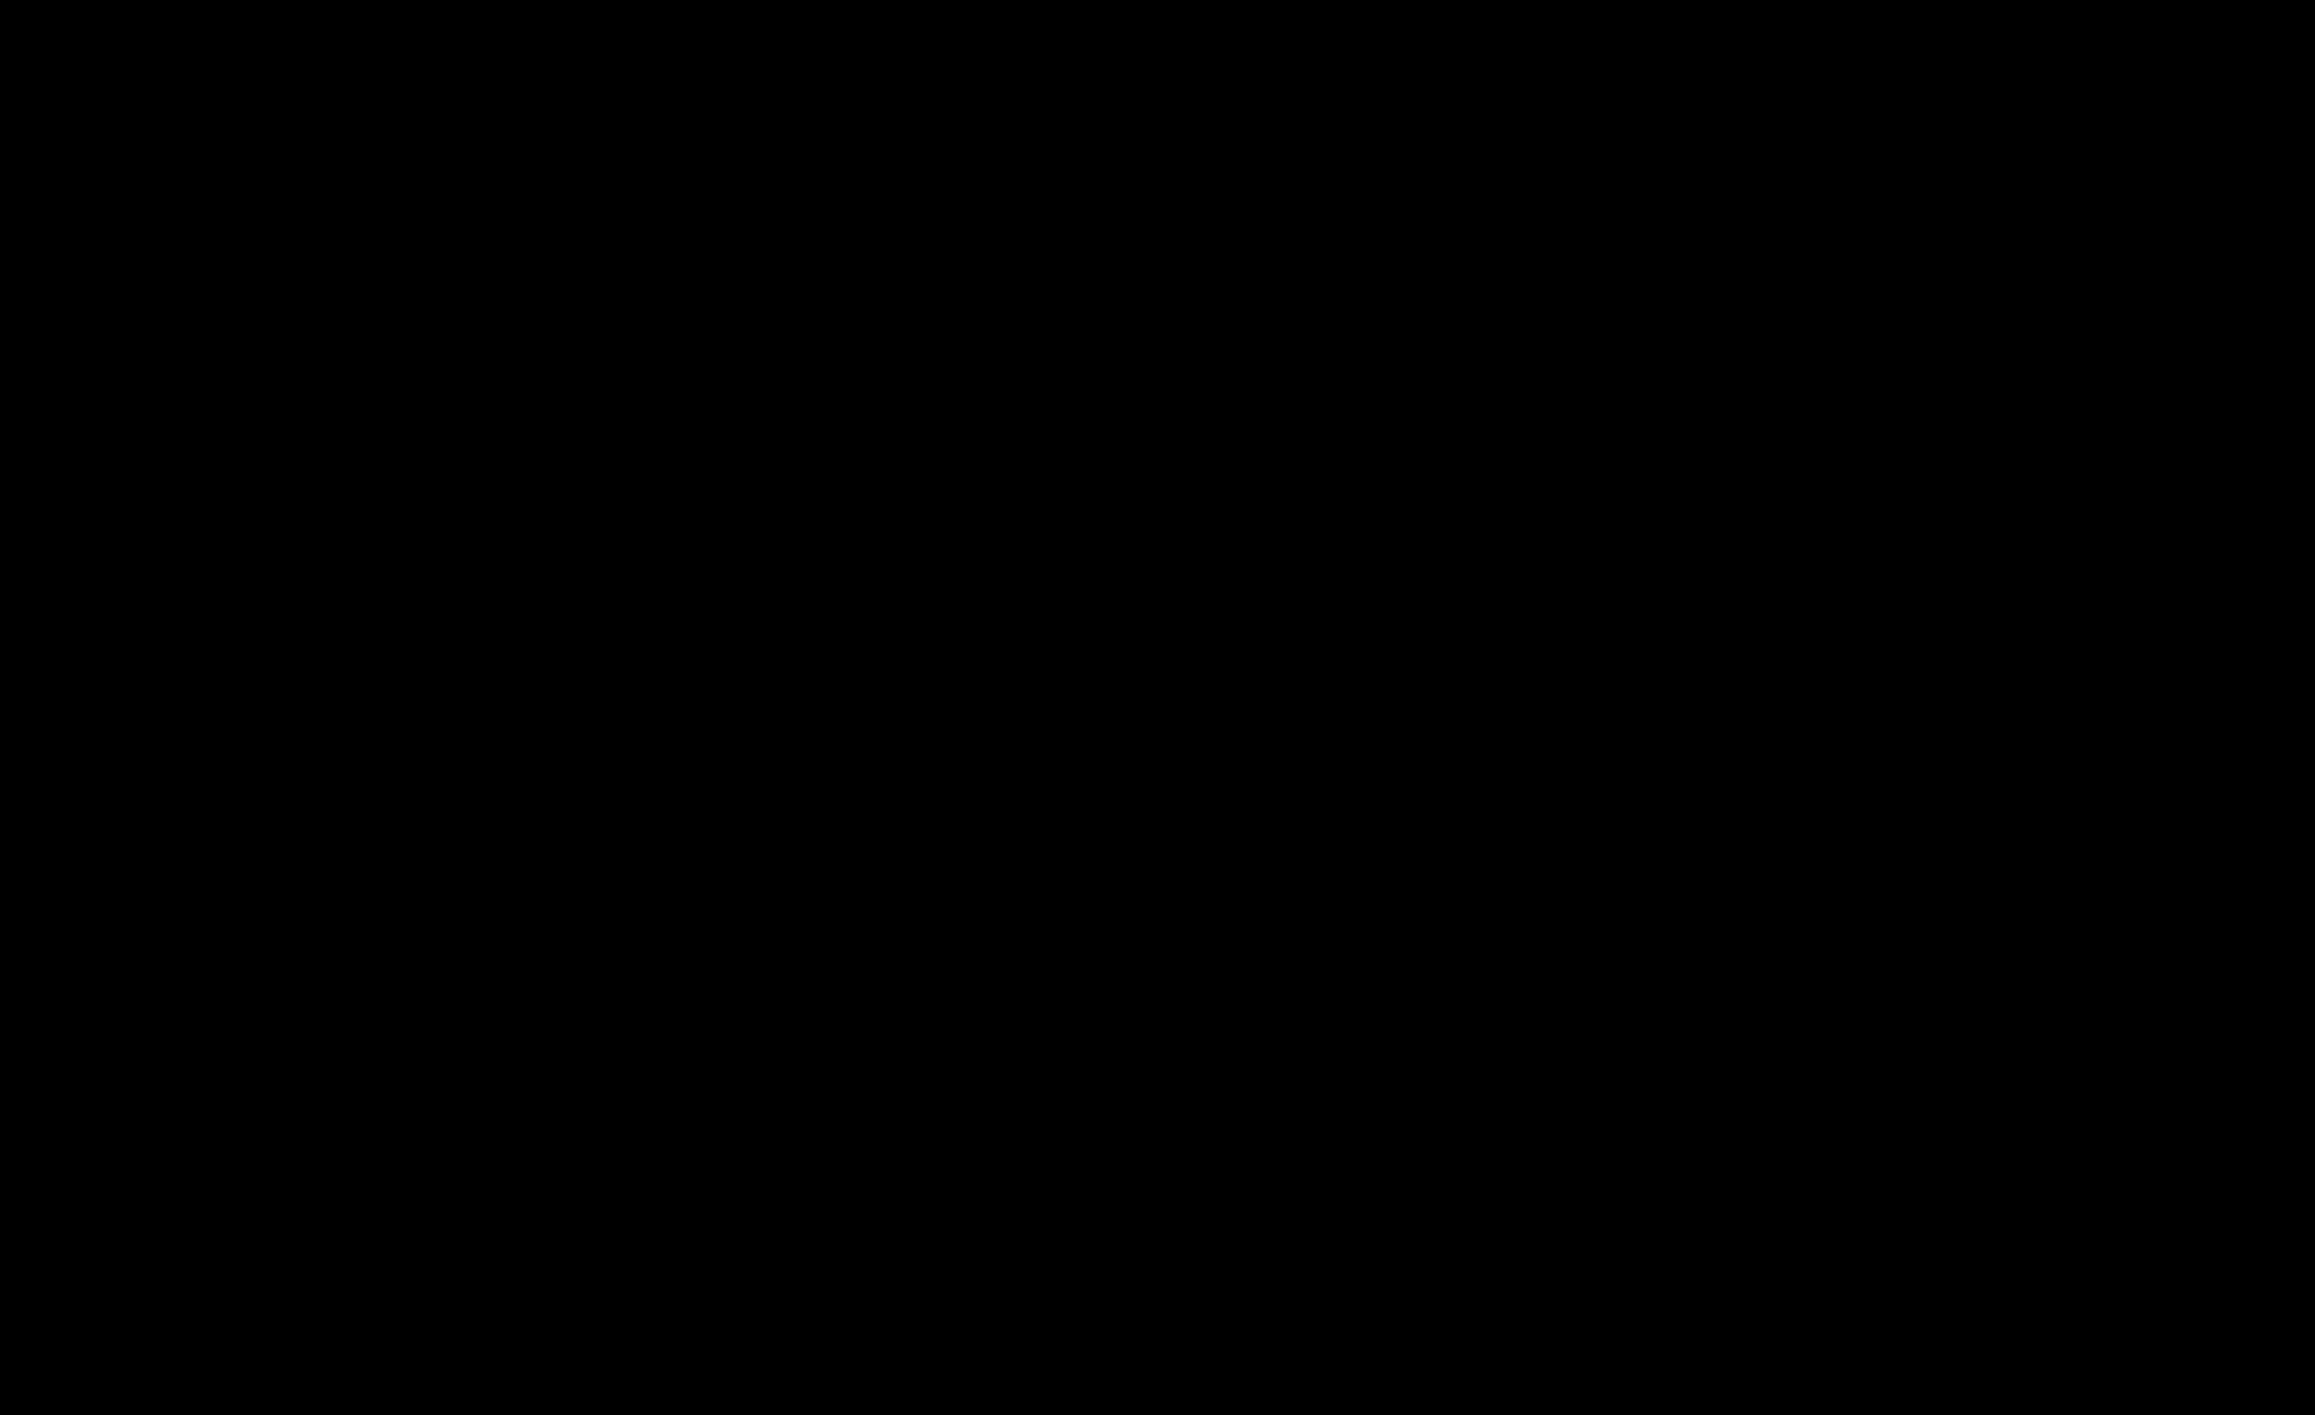 Silhouette Elephant Clipart - Clipart Suggest